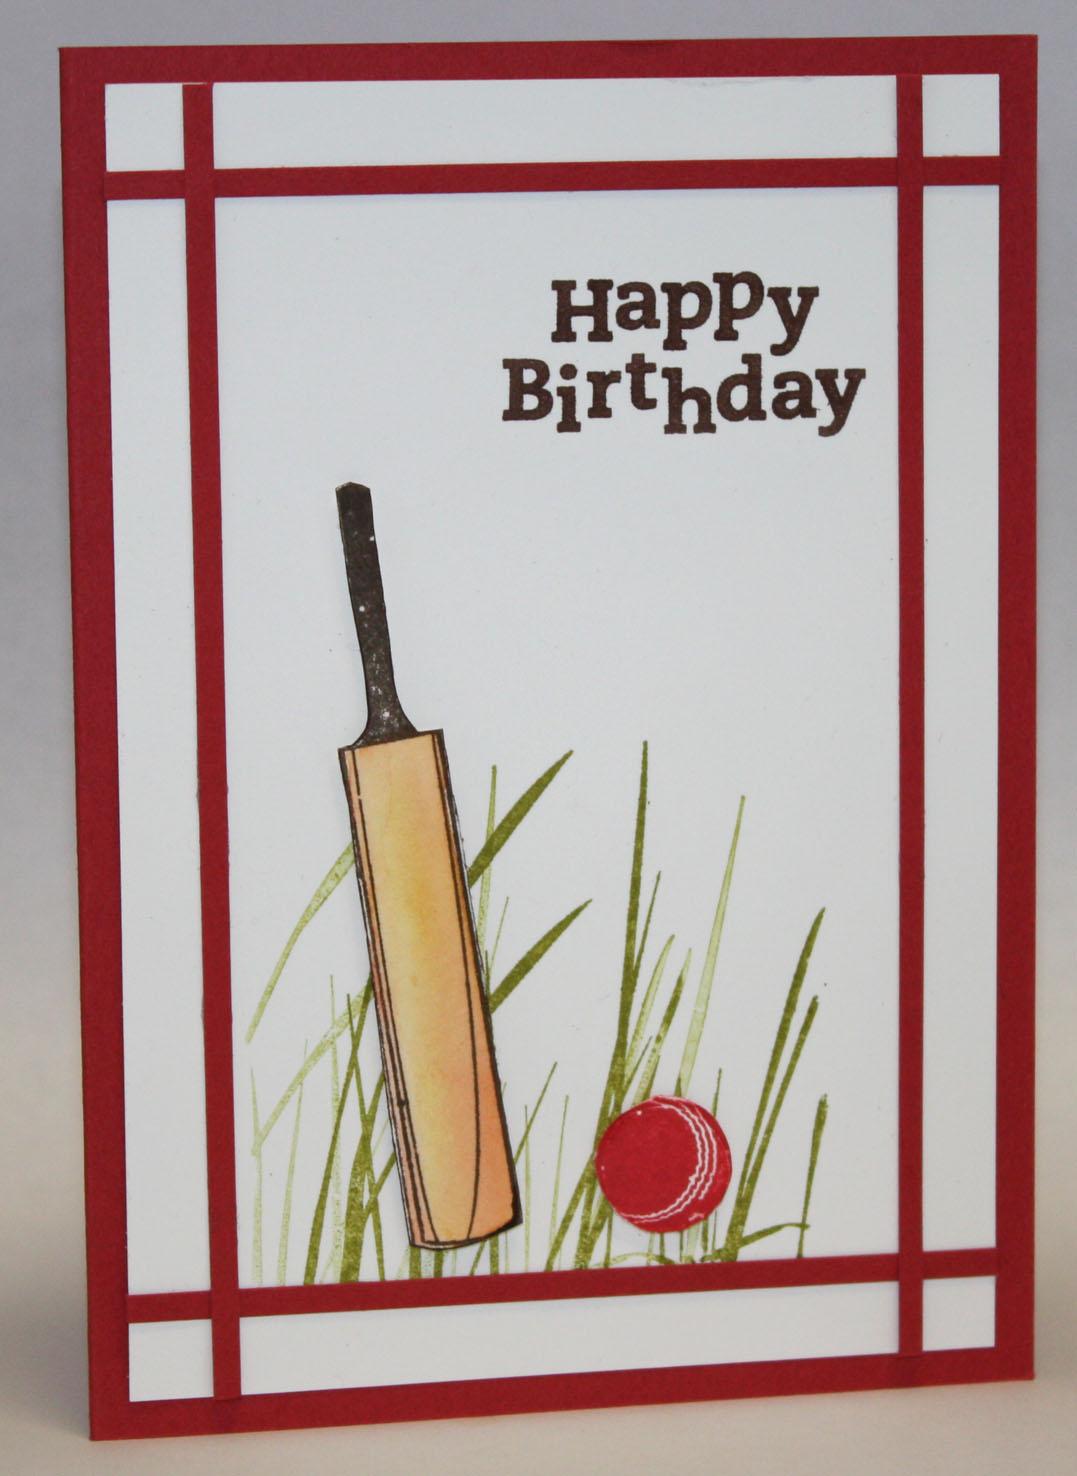 Crafty Kims Creations CricketThemed Birthday Celebration – Themed Birthday Cards